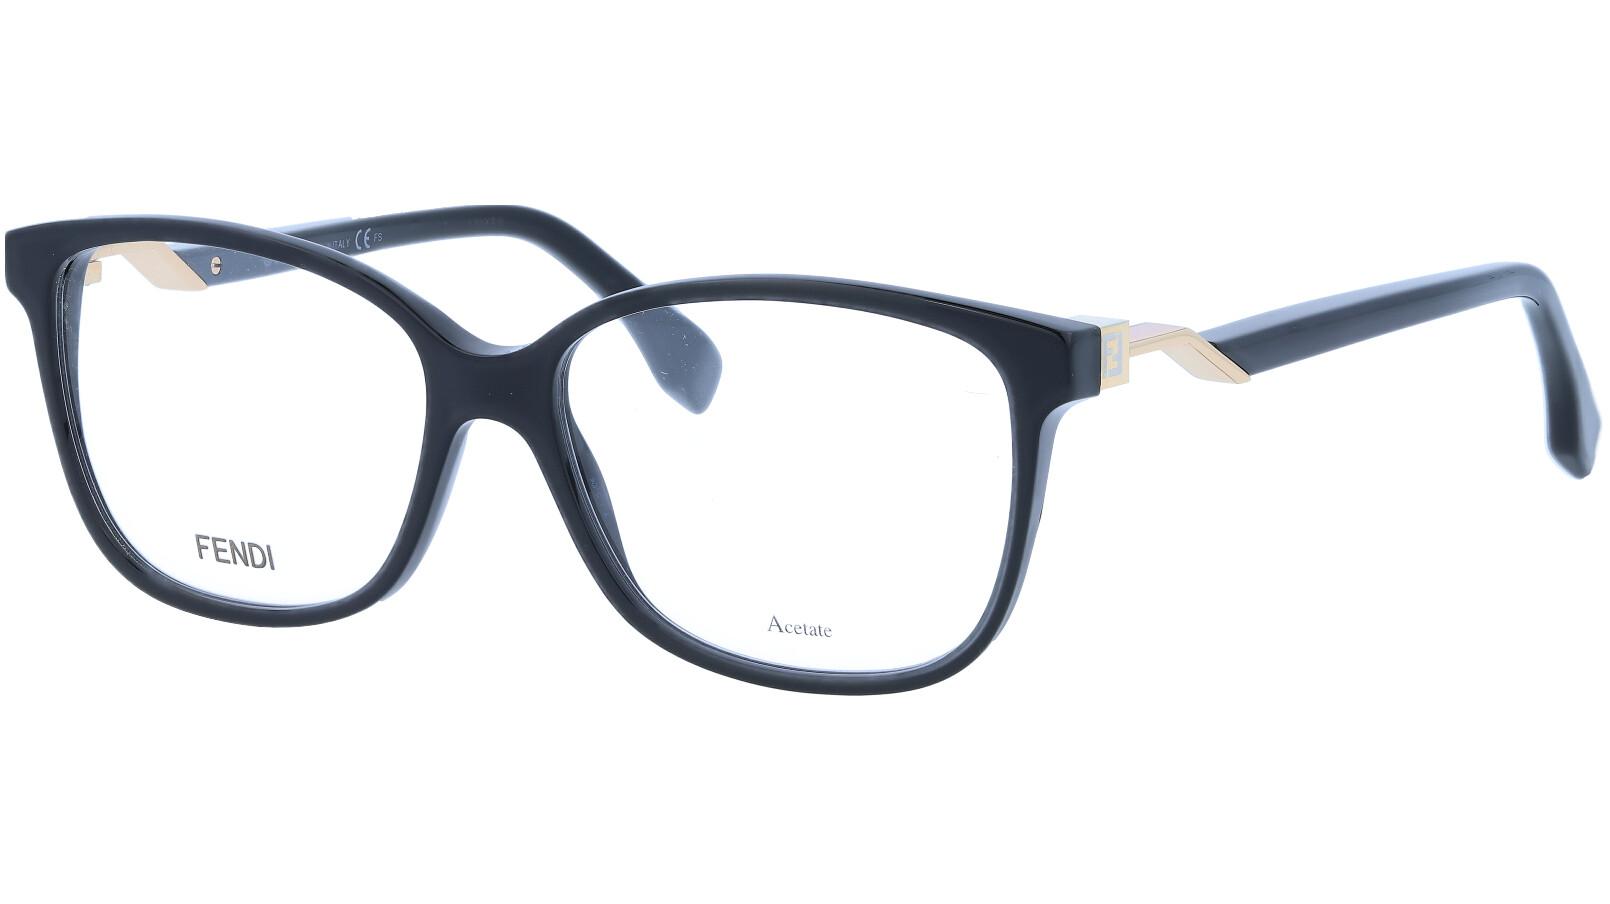 FENDI FF0232 807 53 BLACK Glasses